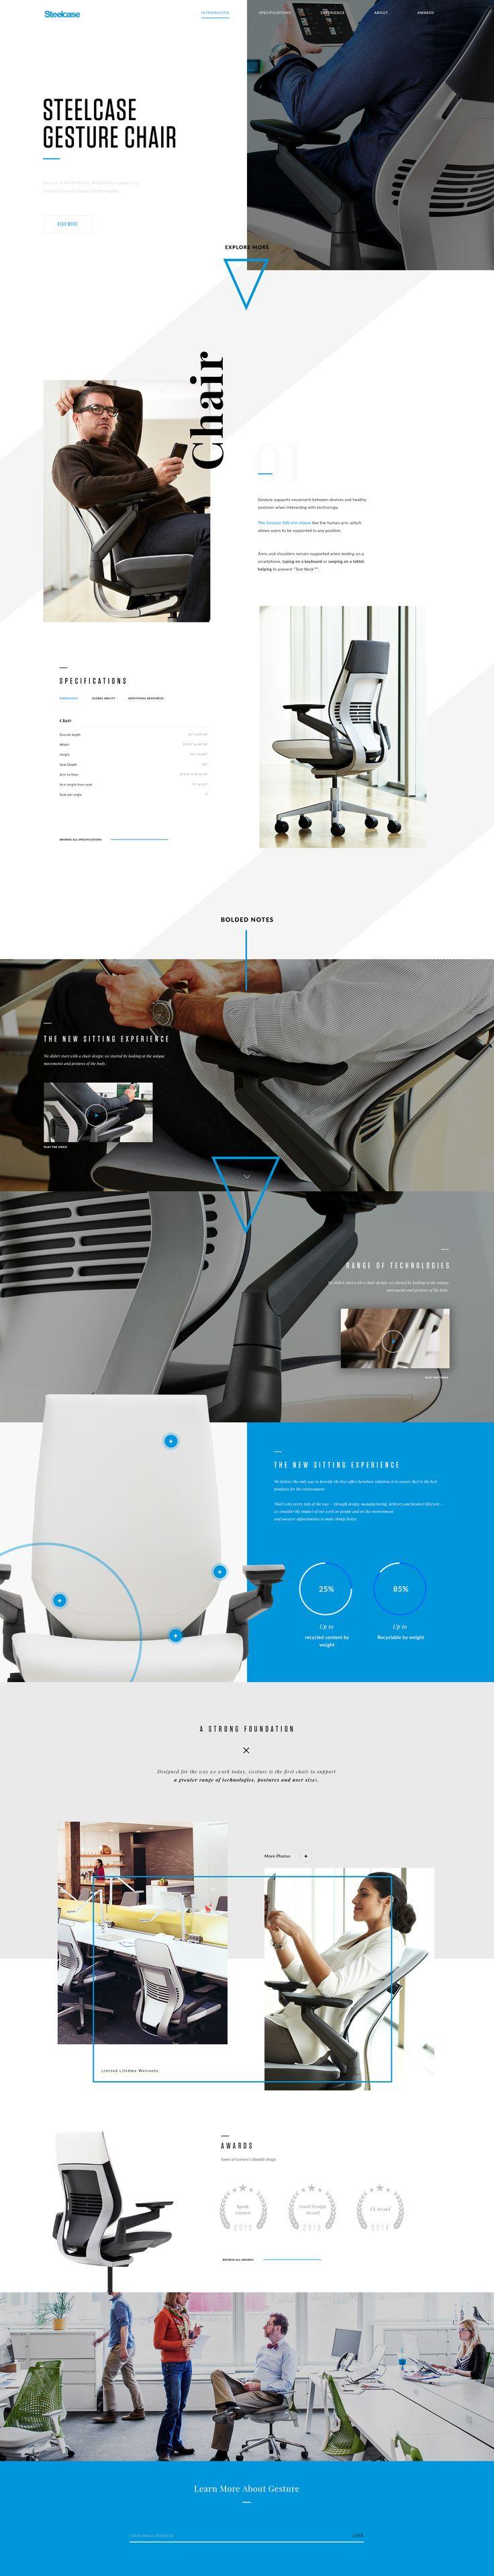 Steelcase Gesture Chair #webdesign #landing #ux #interface